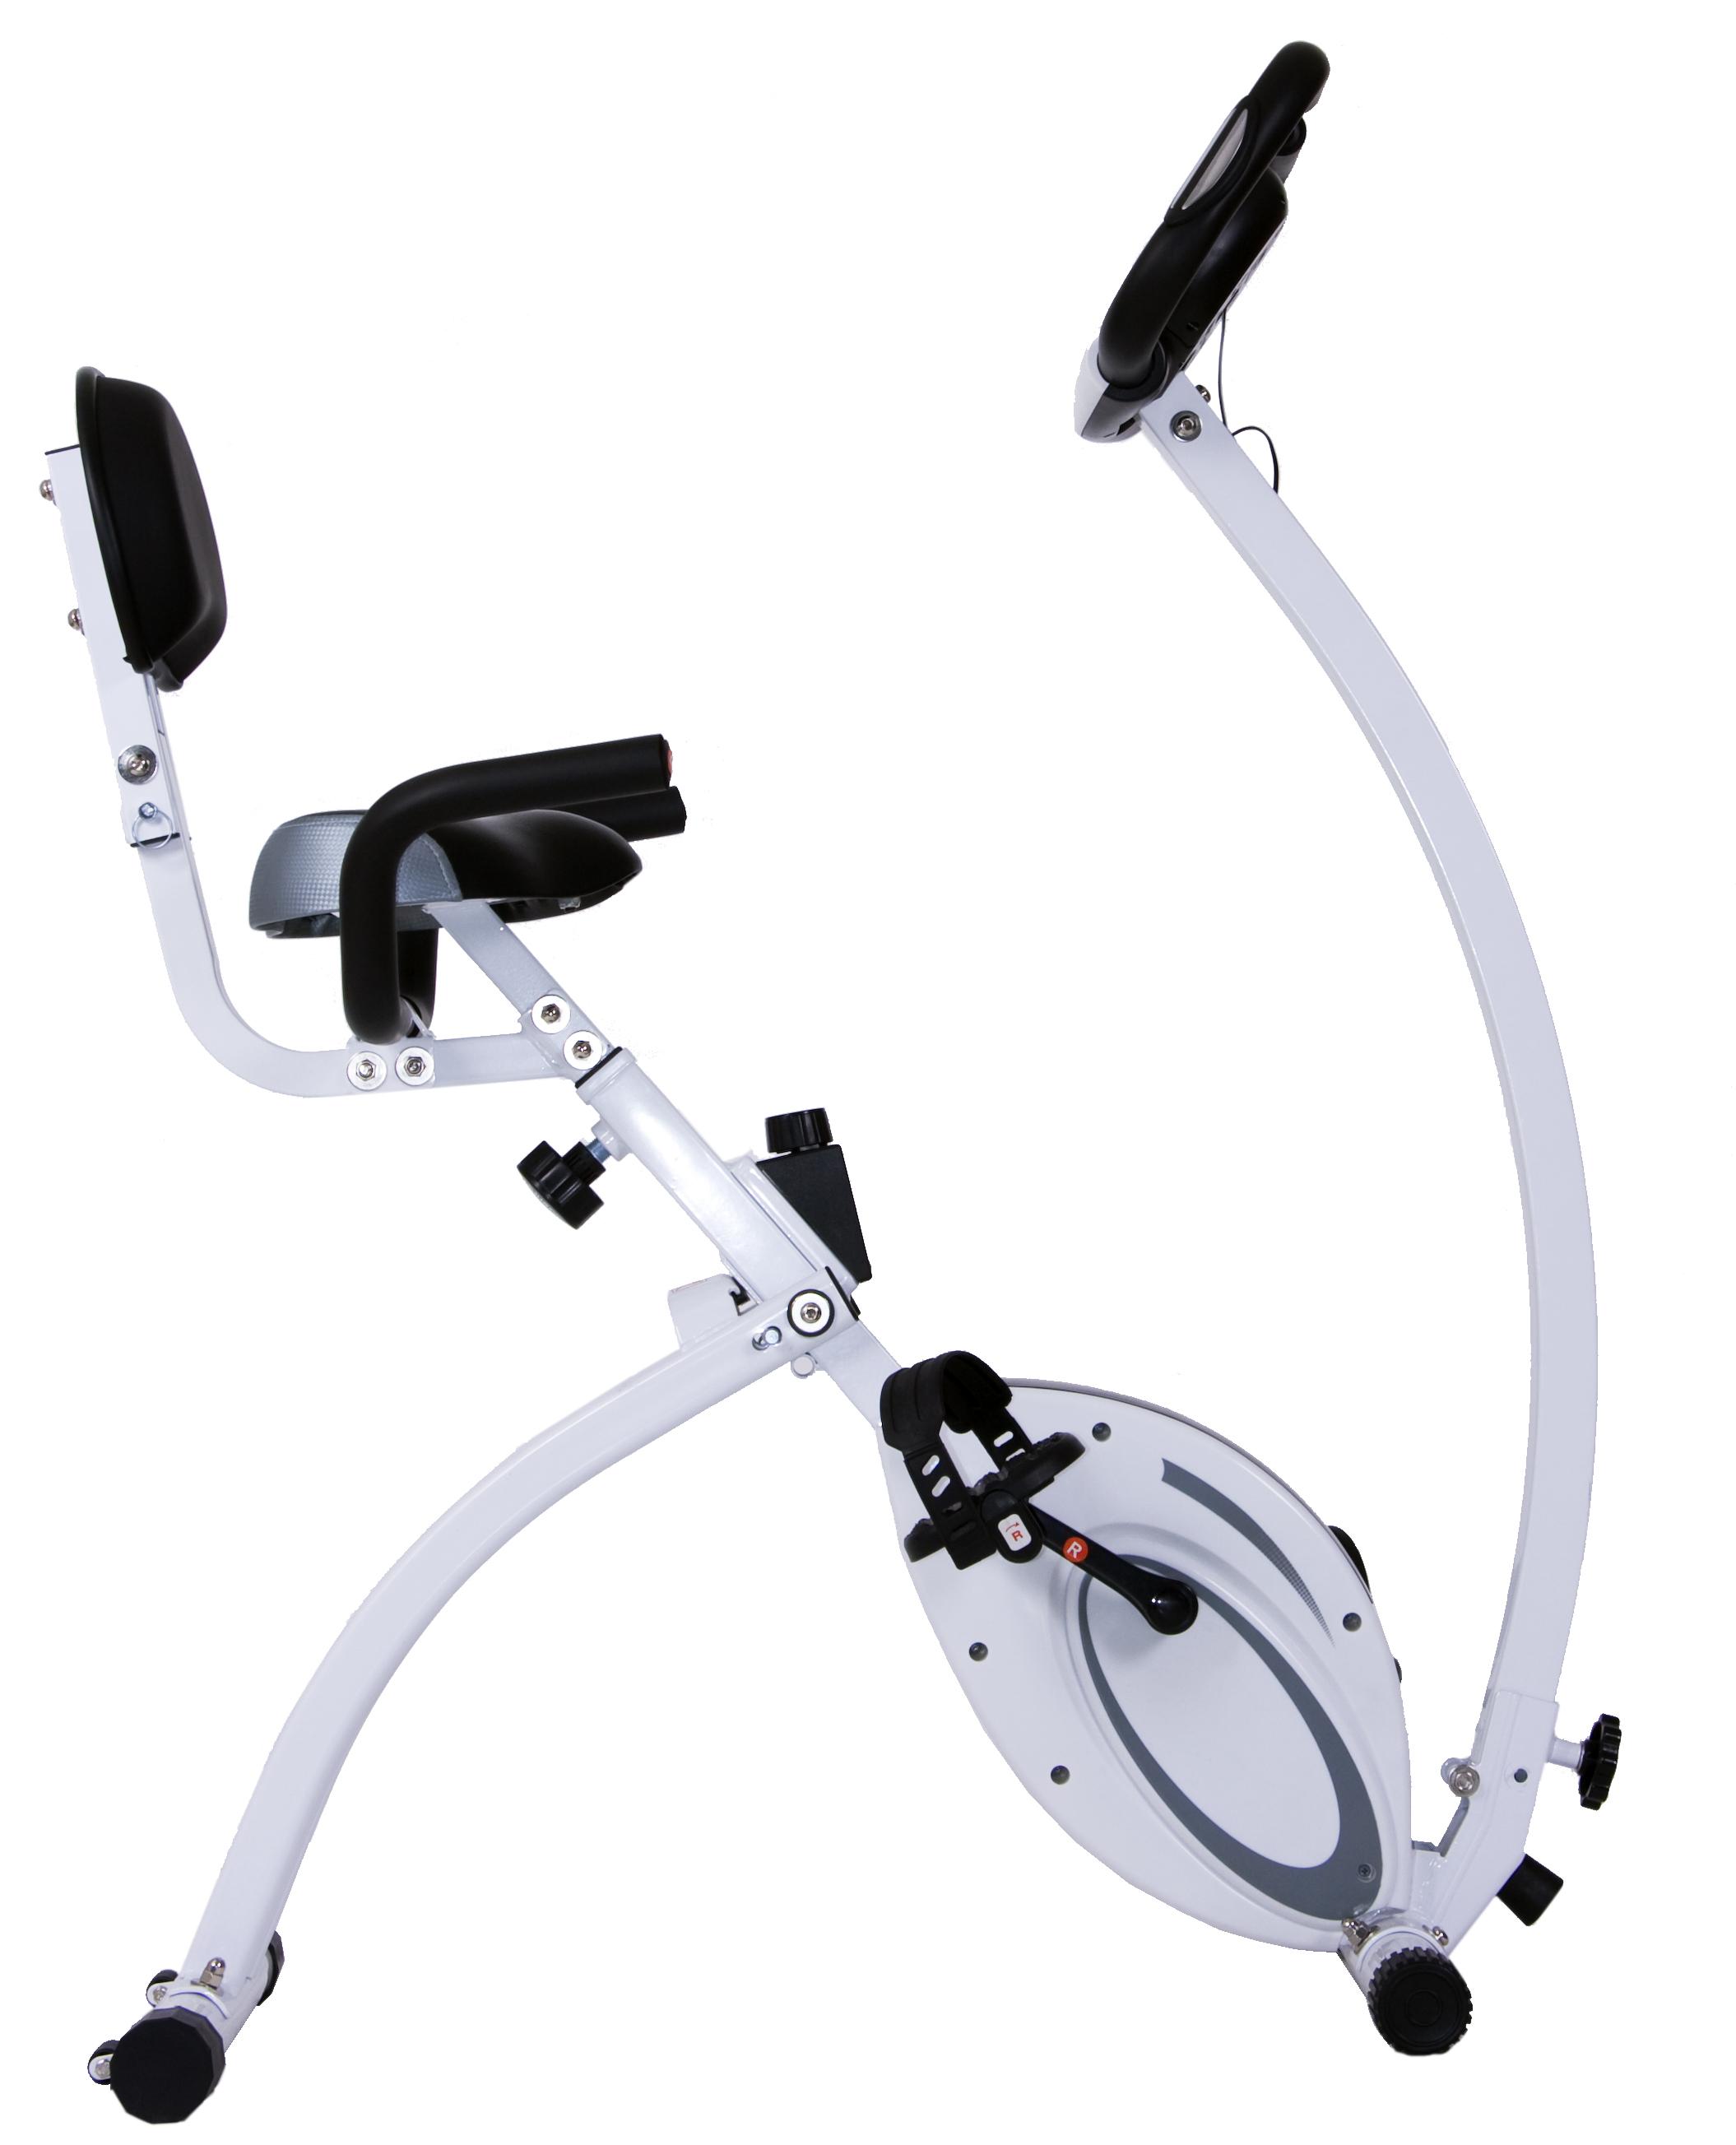 Body Rider XRB638 2-in-1 Folding Upright / Recumbent Bike